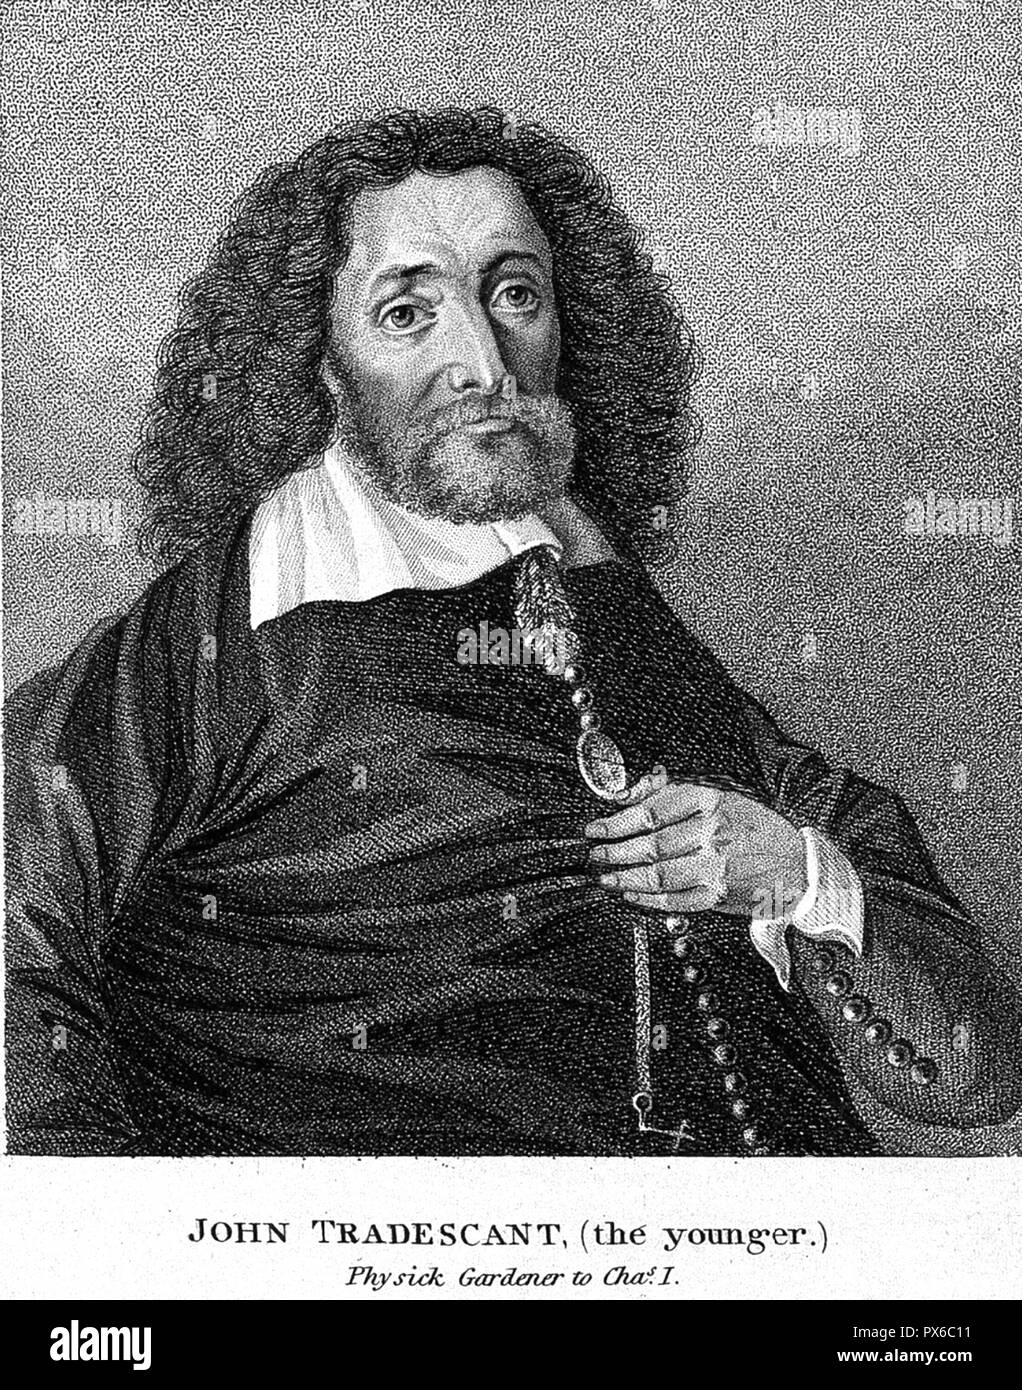 Le jeune JOHN TRADESCANT (1608-1662) Botaniste et jardinier Anglais Photo Stock